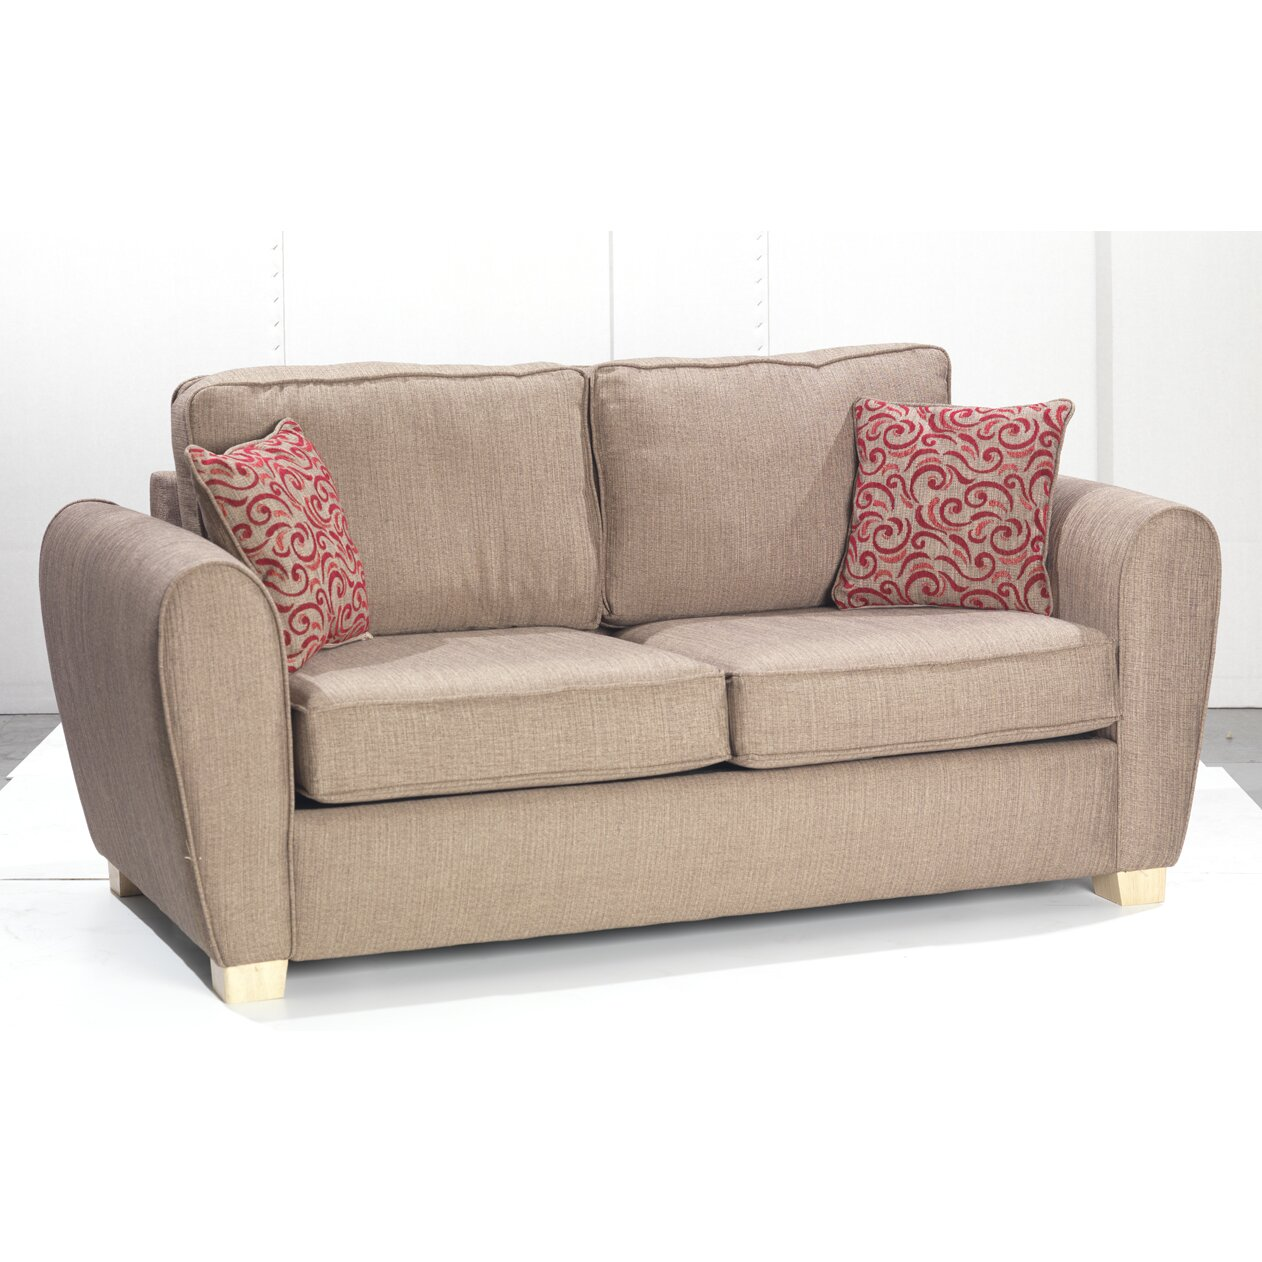 Uk Icon Design Italy 3 Seater Fold Out Sofa Wayfair Uk